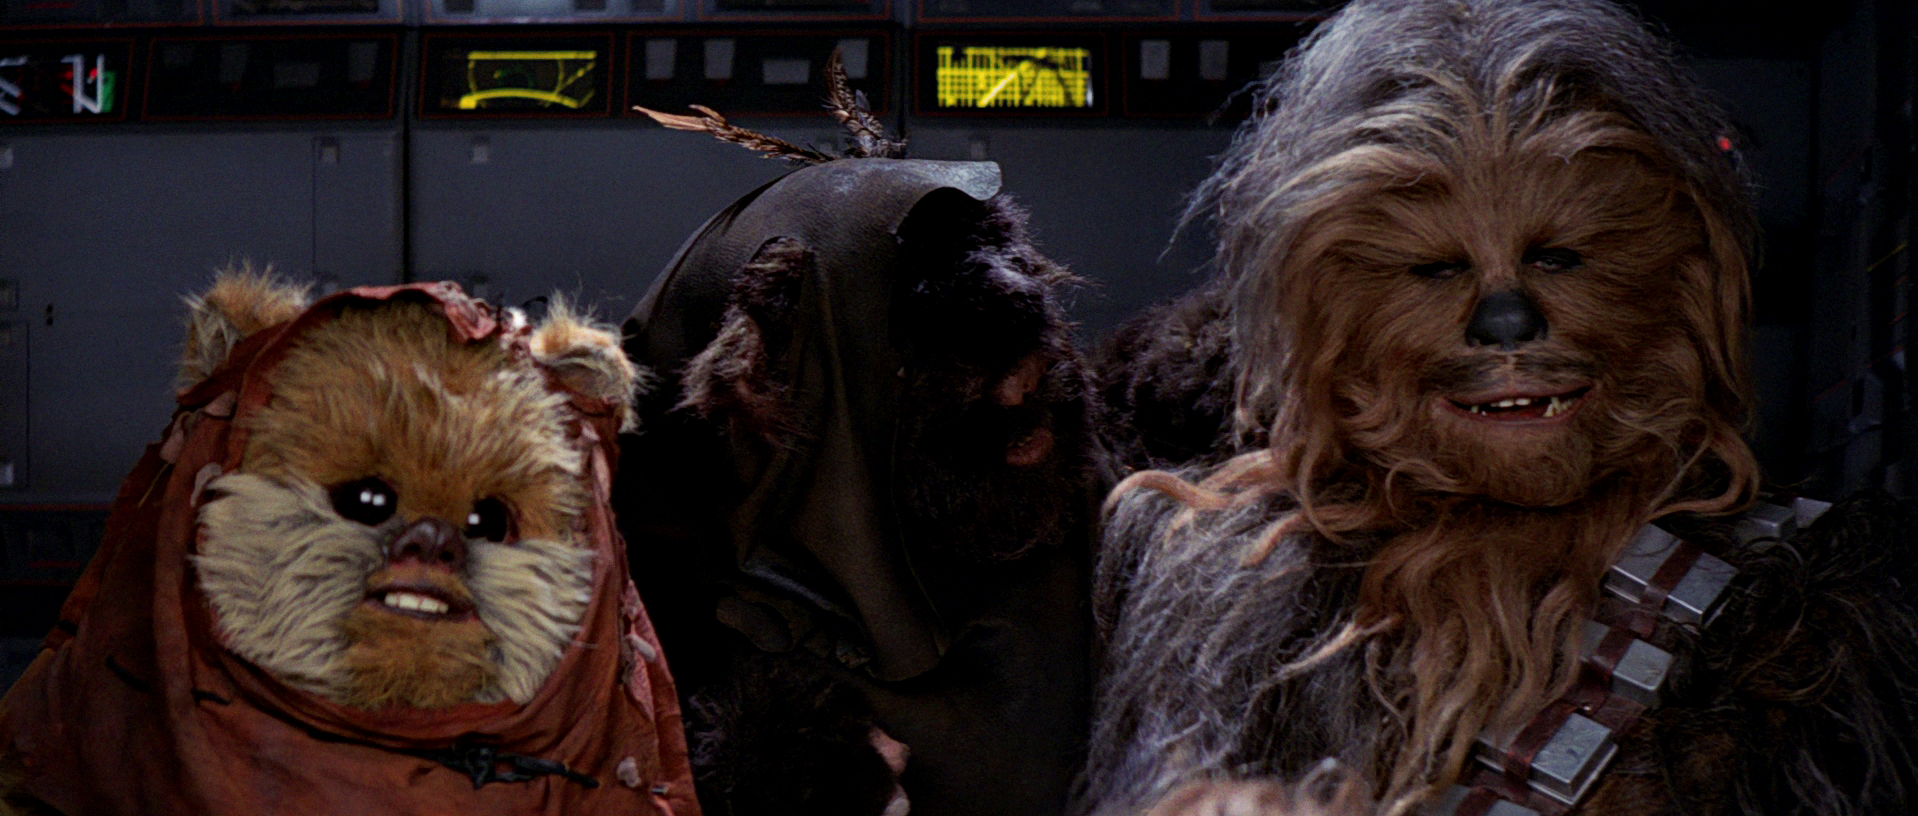 Resultado de imagen de chewbacca at-st